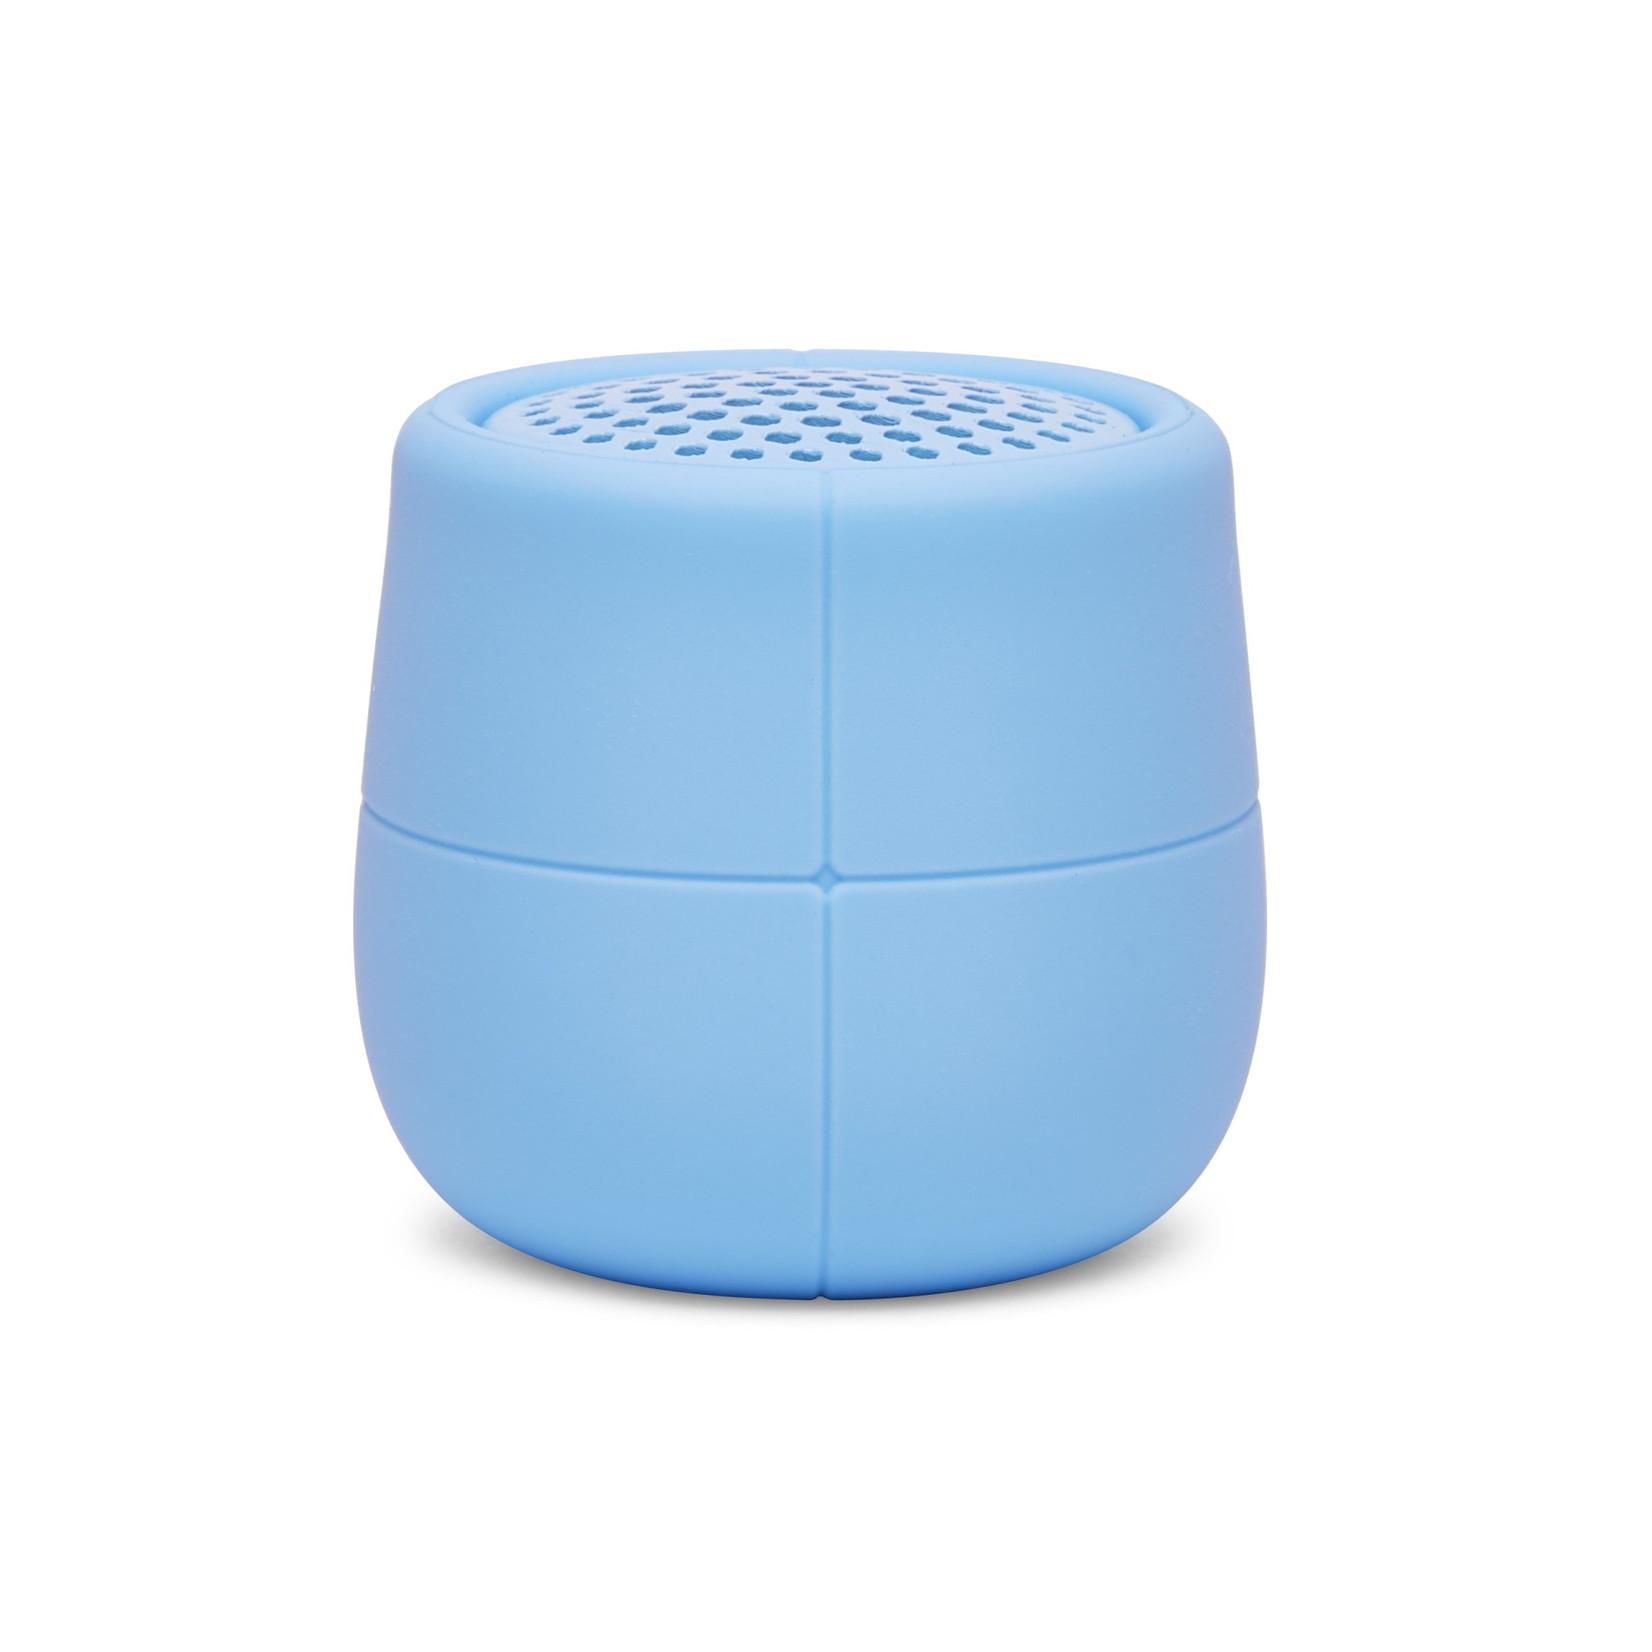 LEXON LEXON MINO X BLUE TOOTH SPEAKER